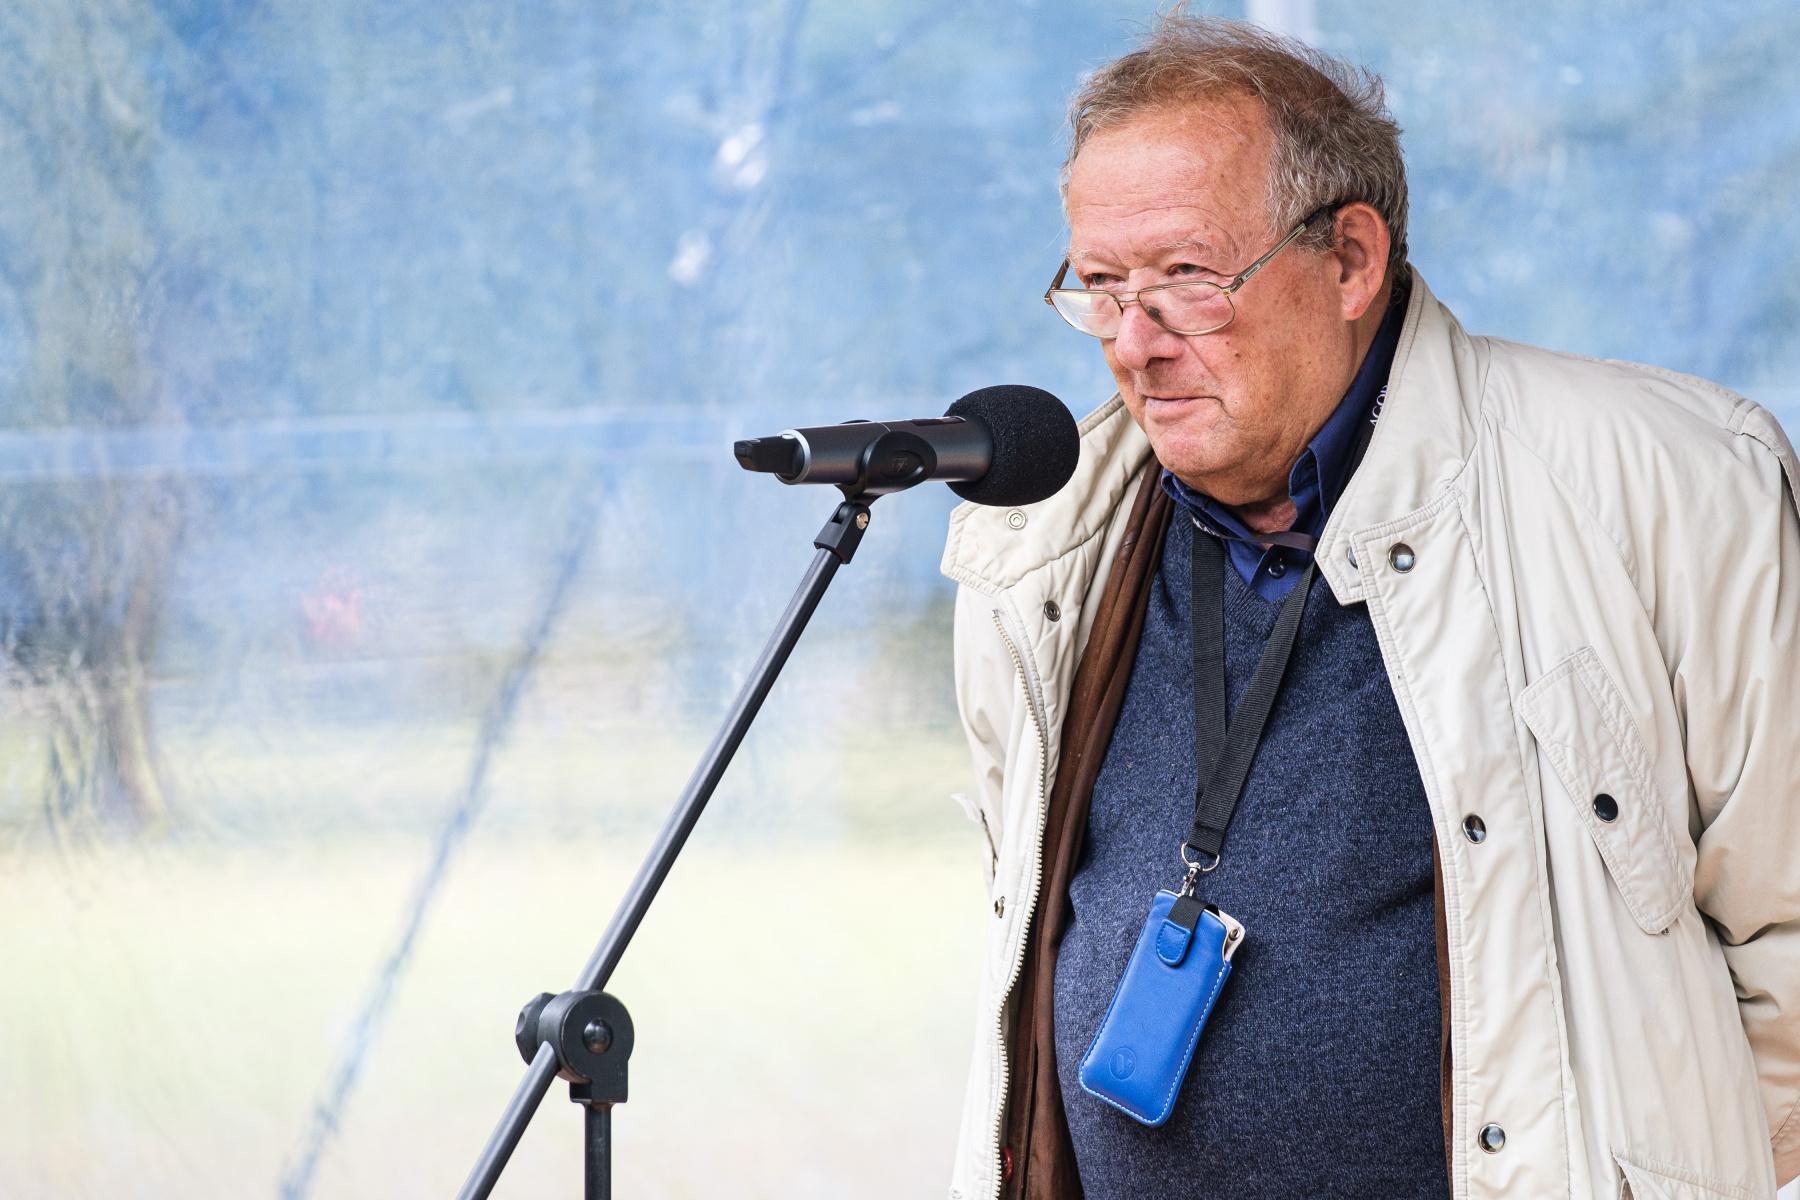 Adam Michnik, Polish essayist, publisher and politician, founder and editor of the Gazeta Wyborcza newspaper